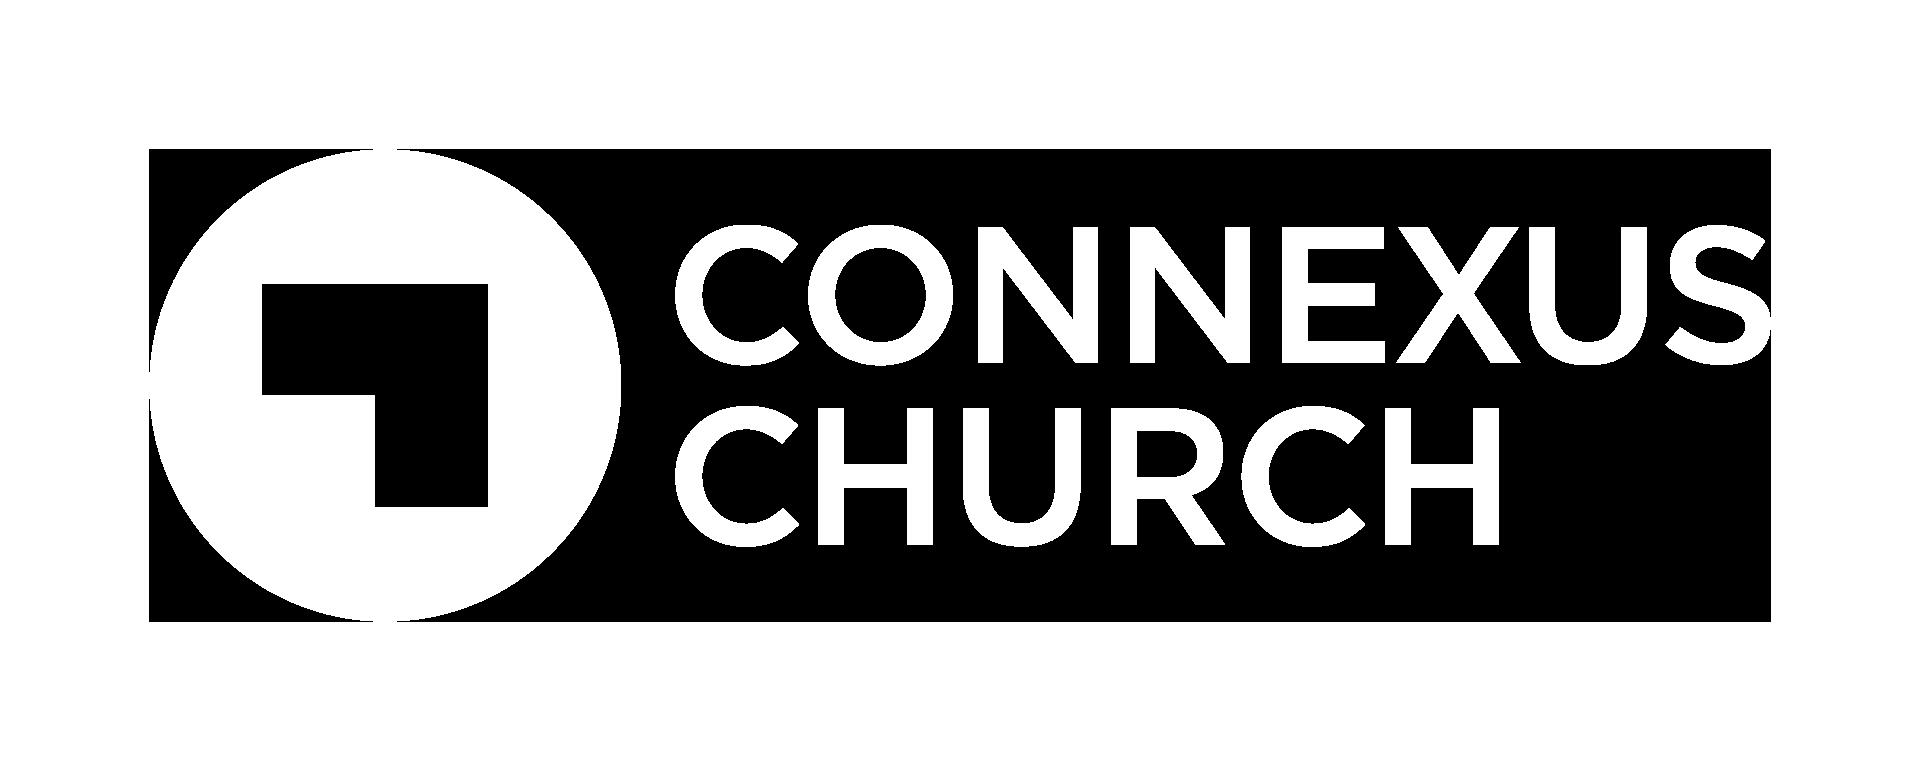 Connexus Church